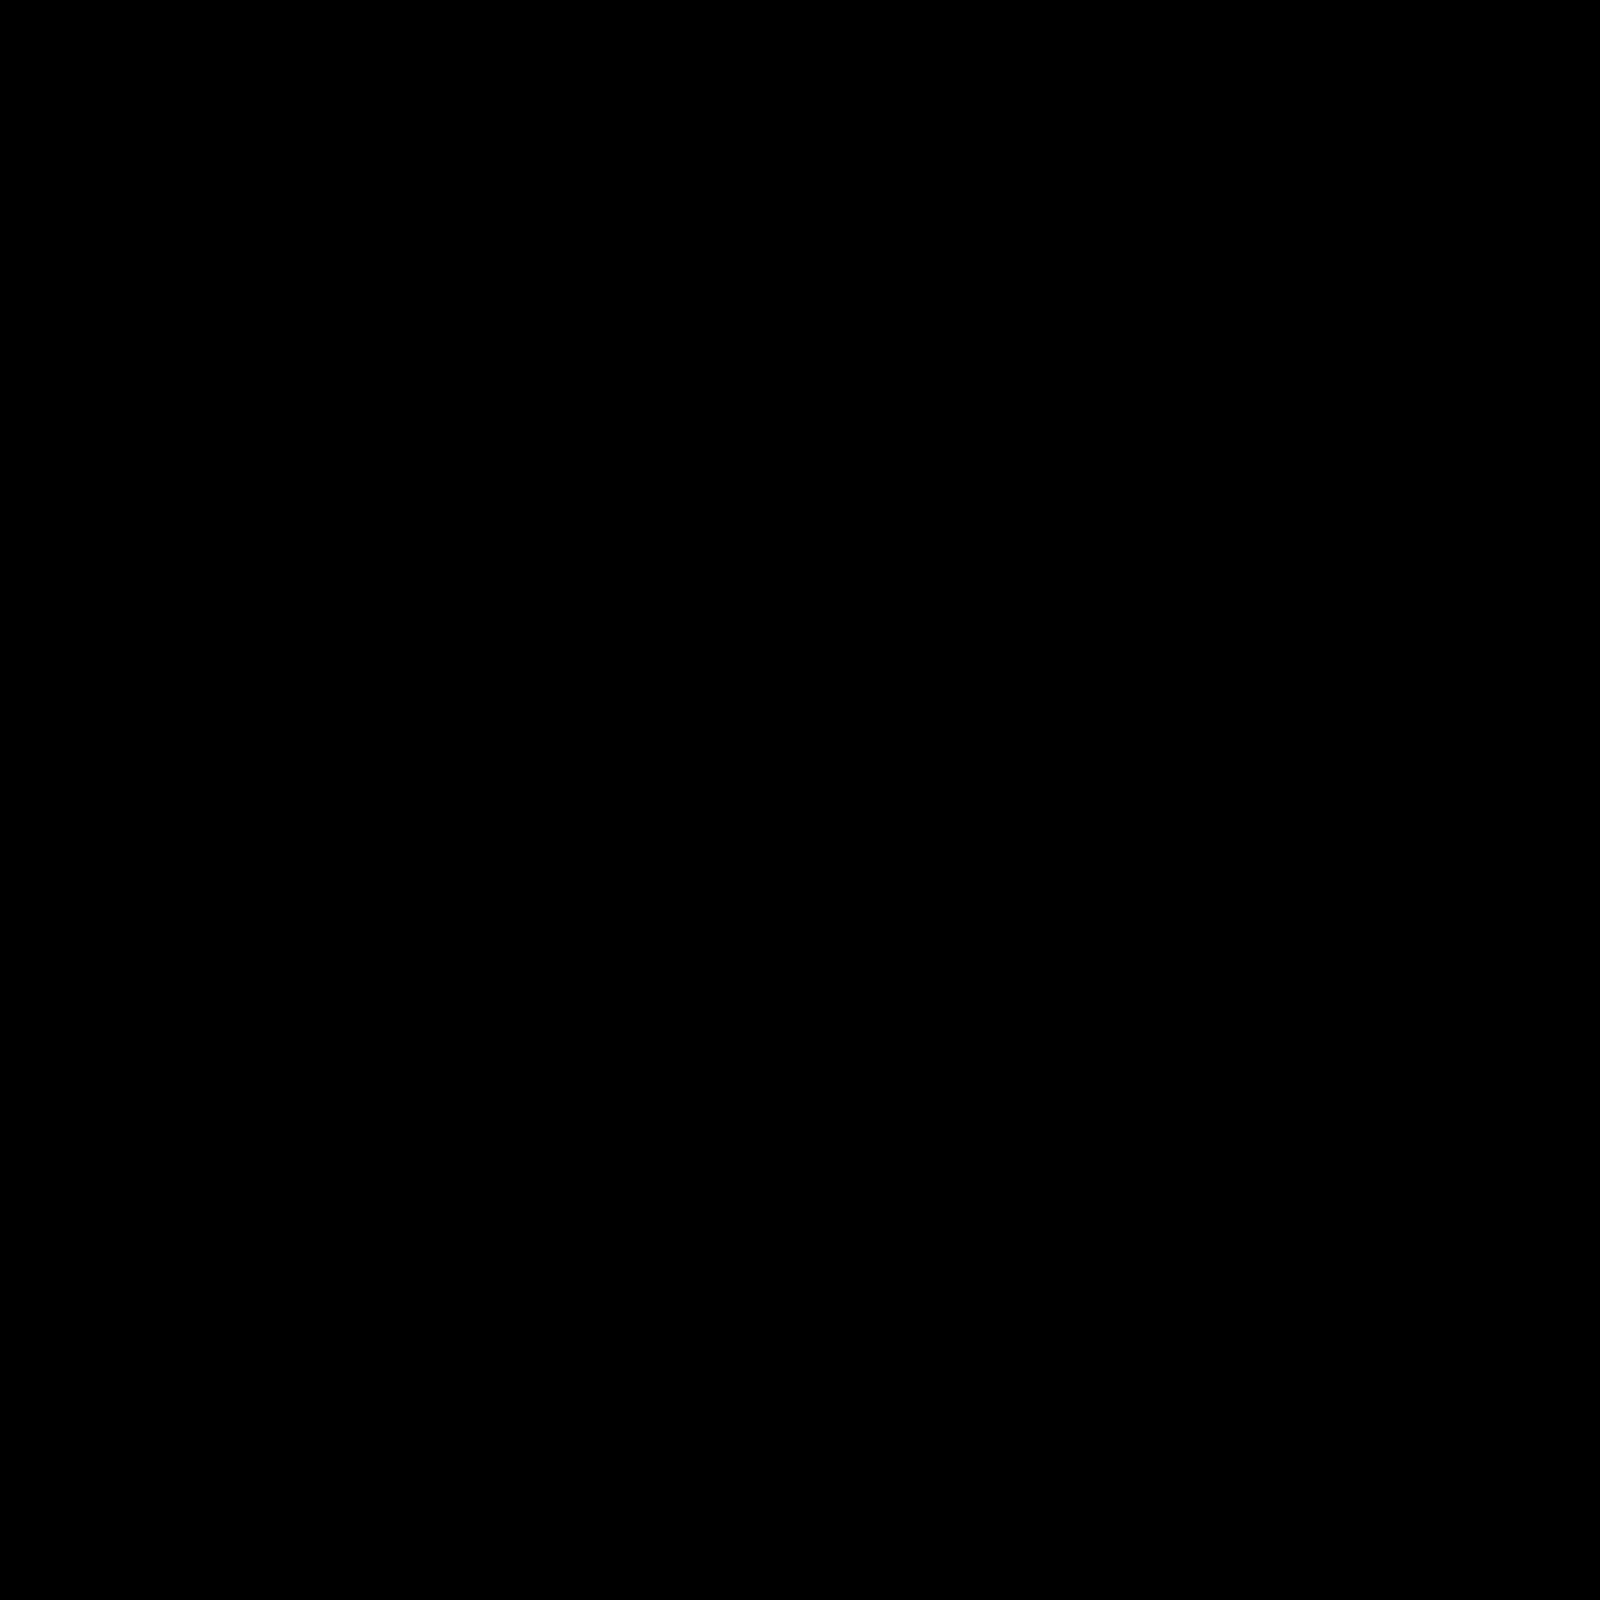 expand-arrow (1).png